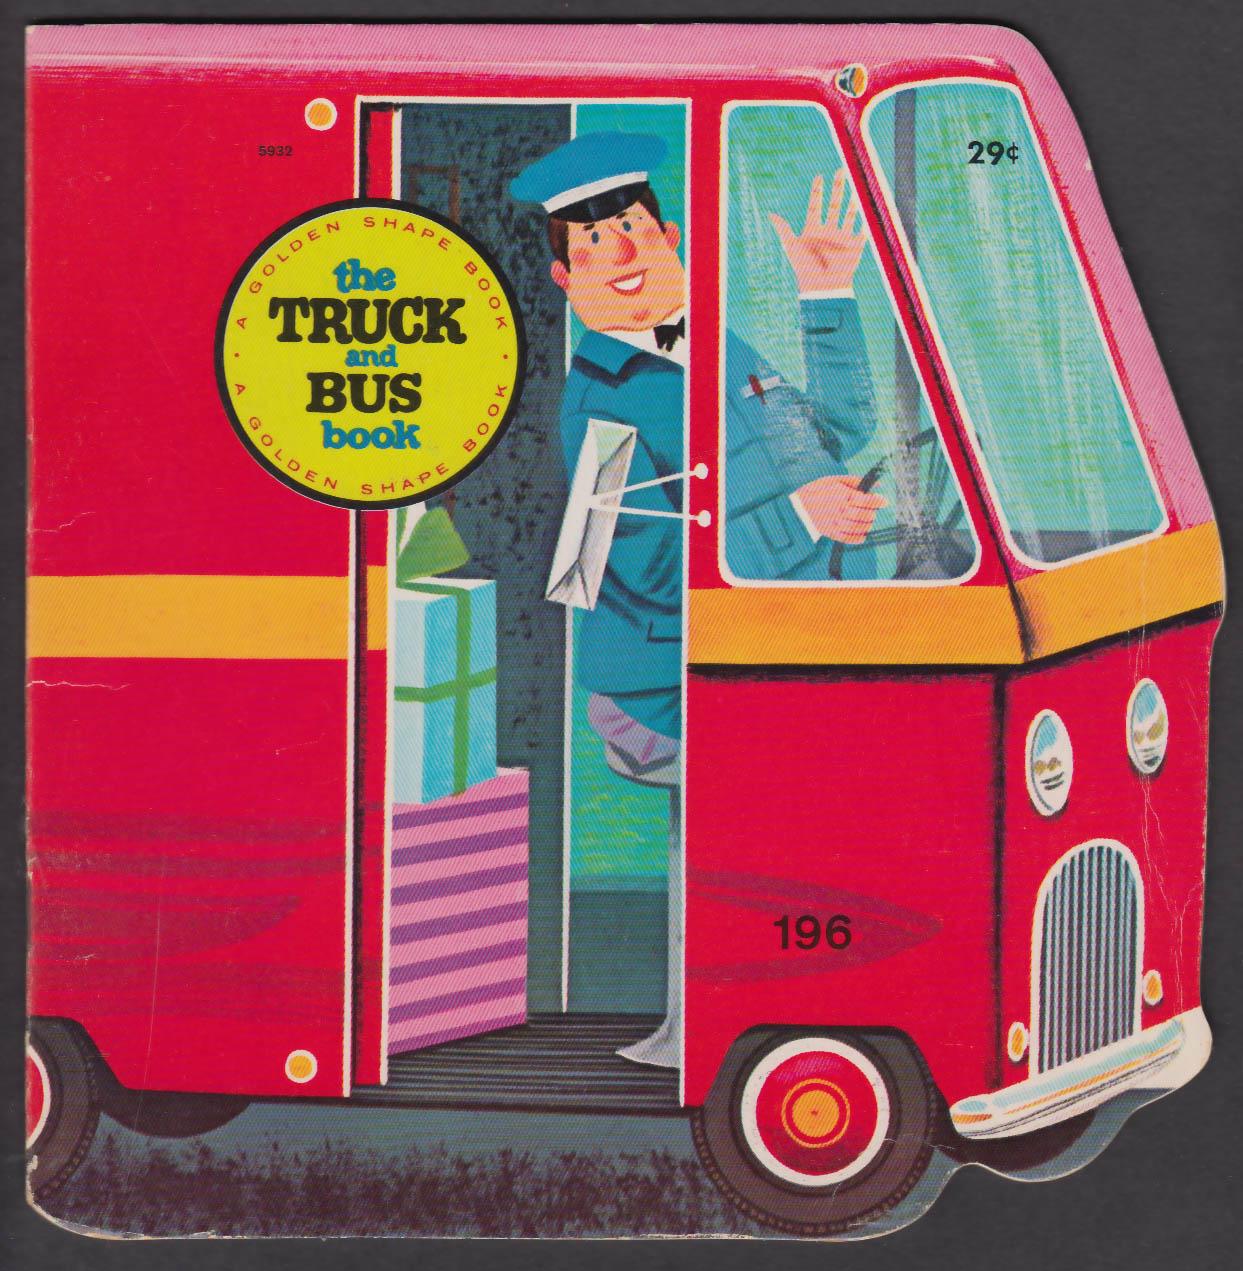 Image for Golden Shape Truck & Bus Book 1966